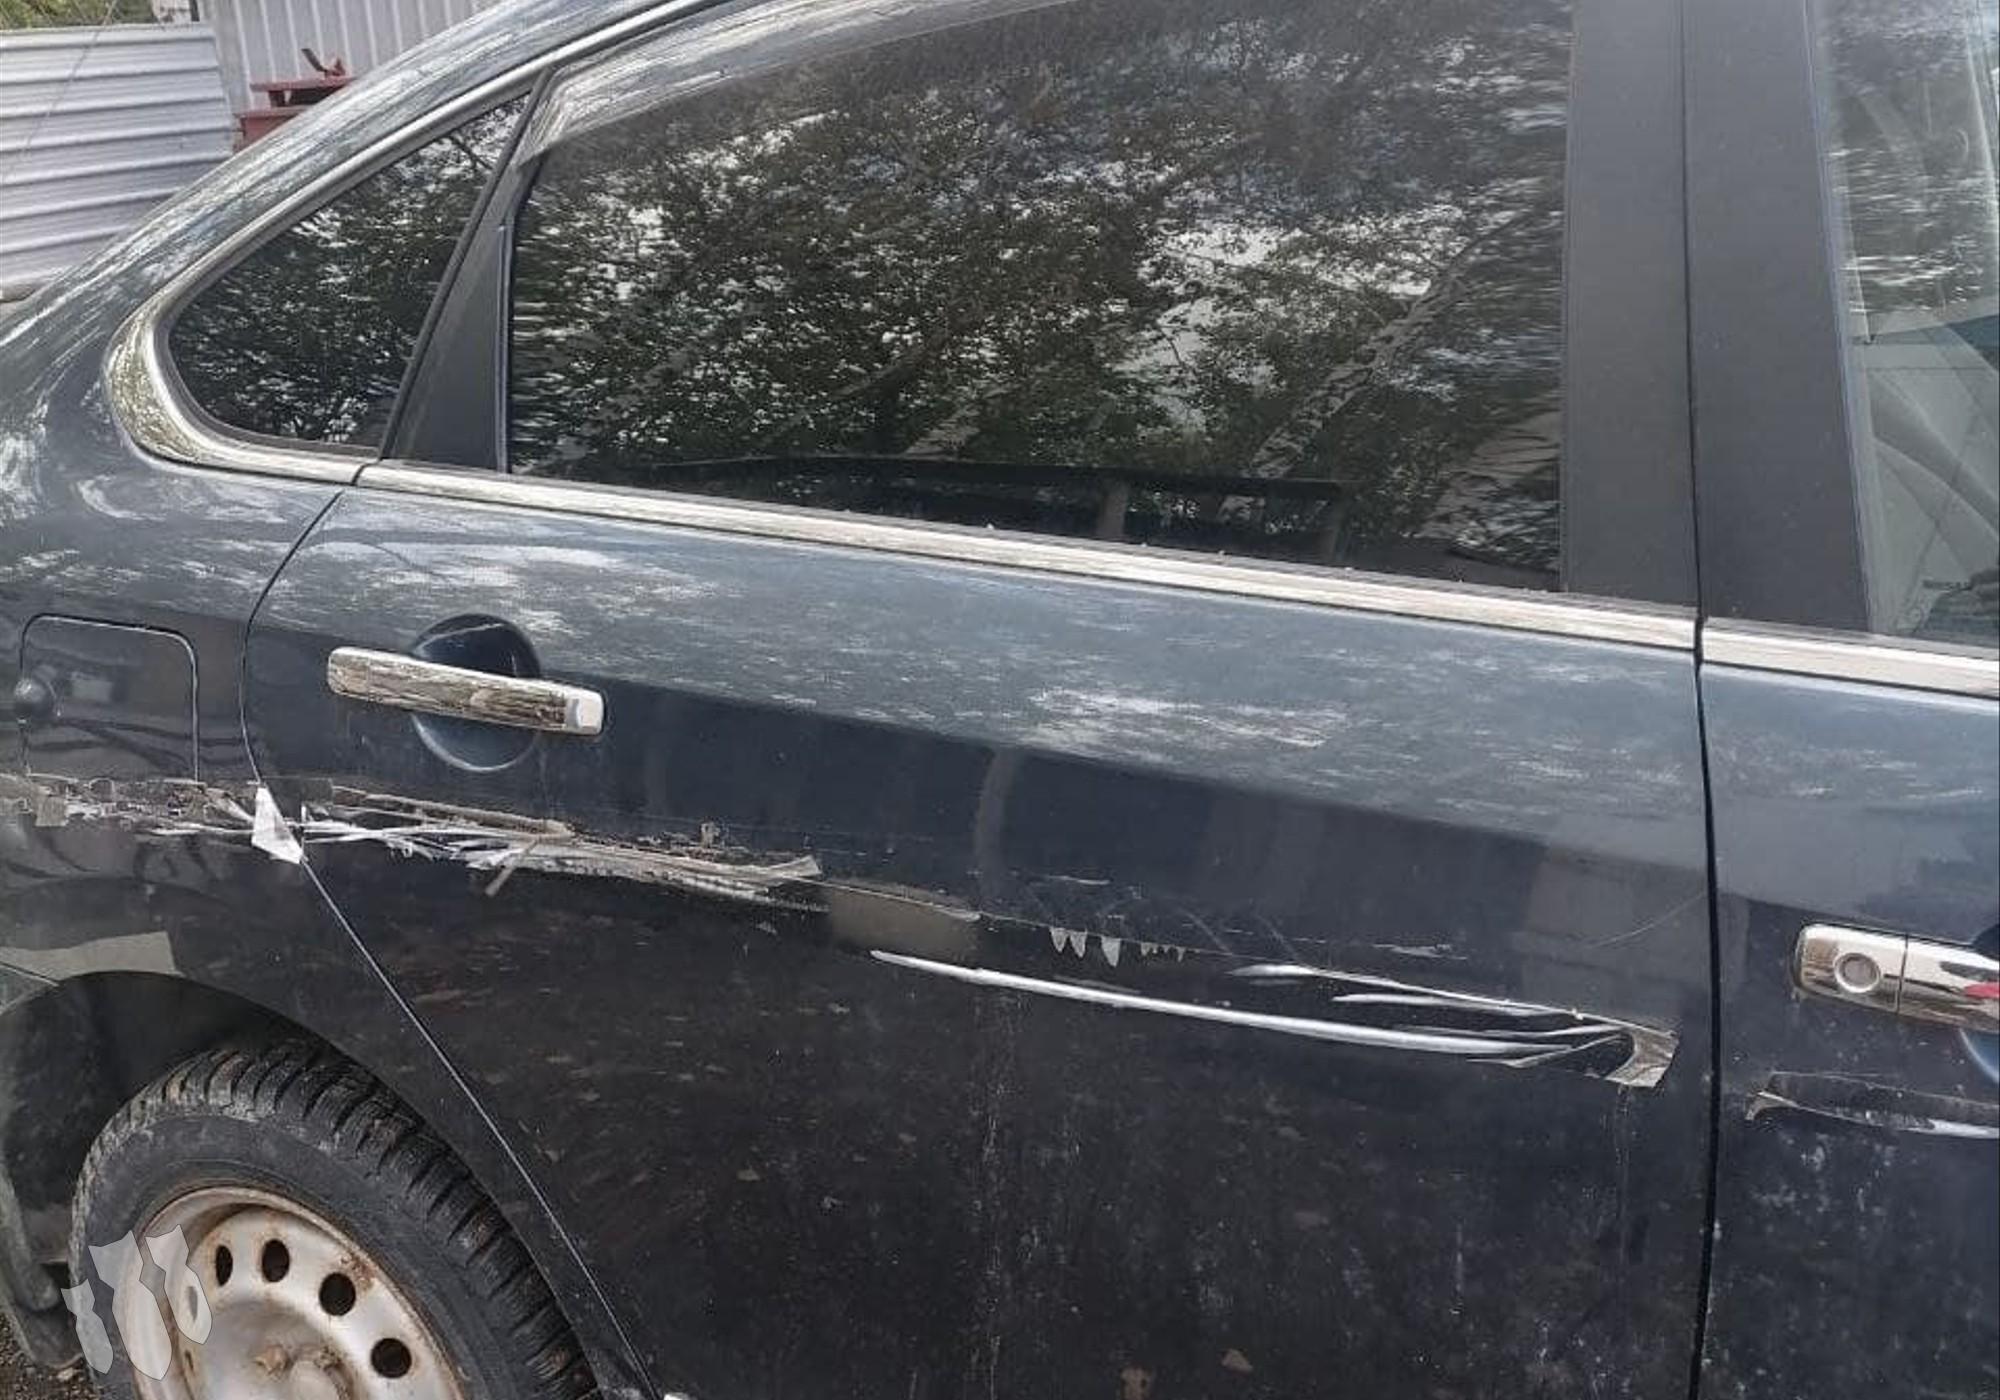 821004AA8B Дверь задняя правая для Nissan Almera III (с 2012 по 2018)